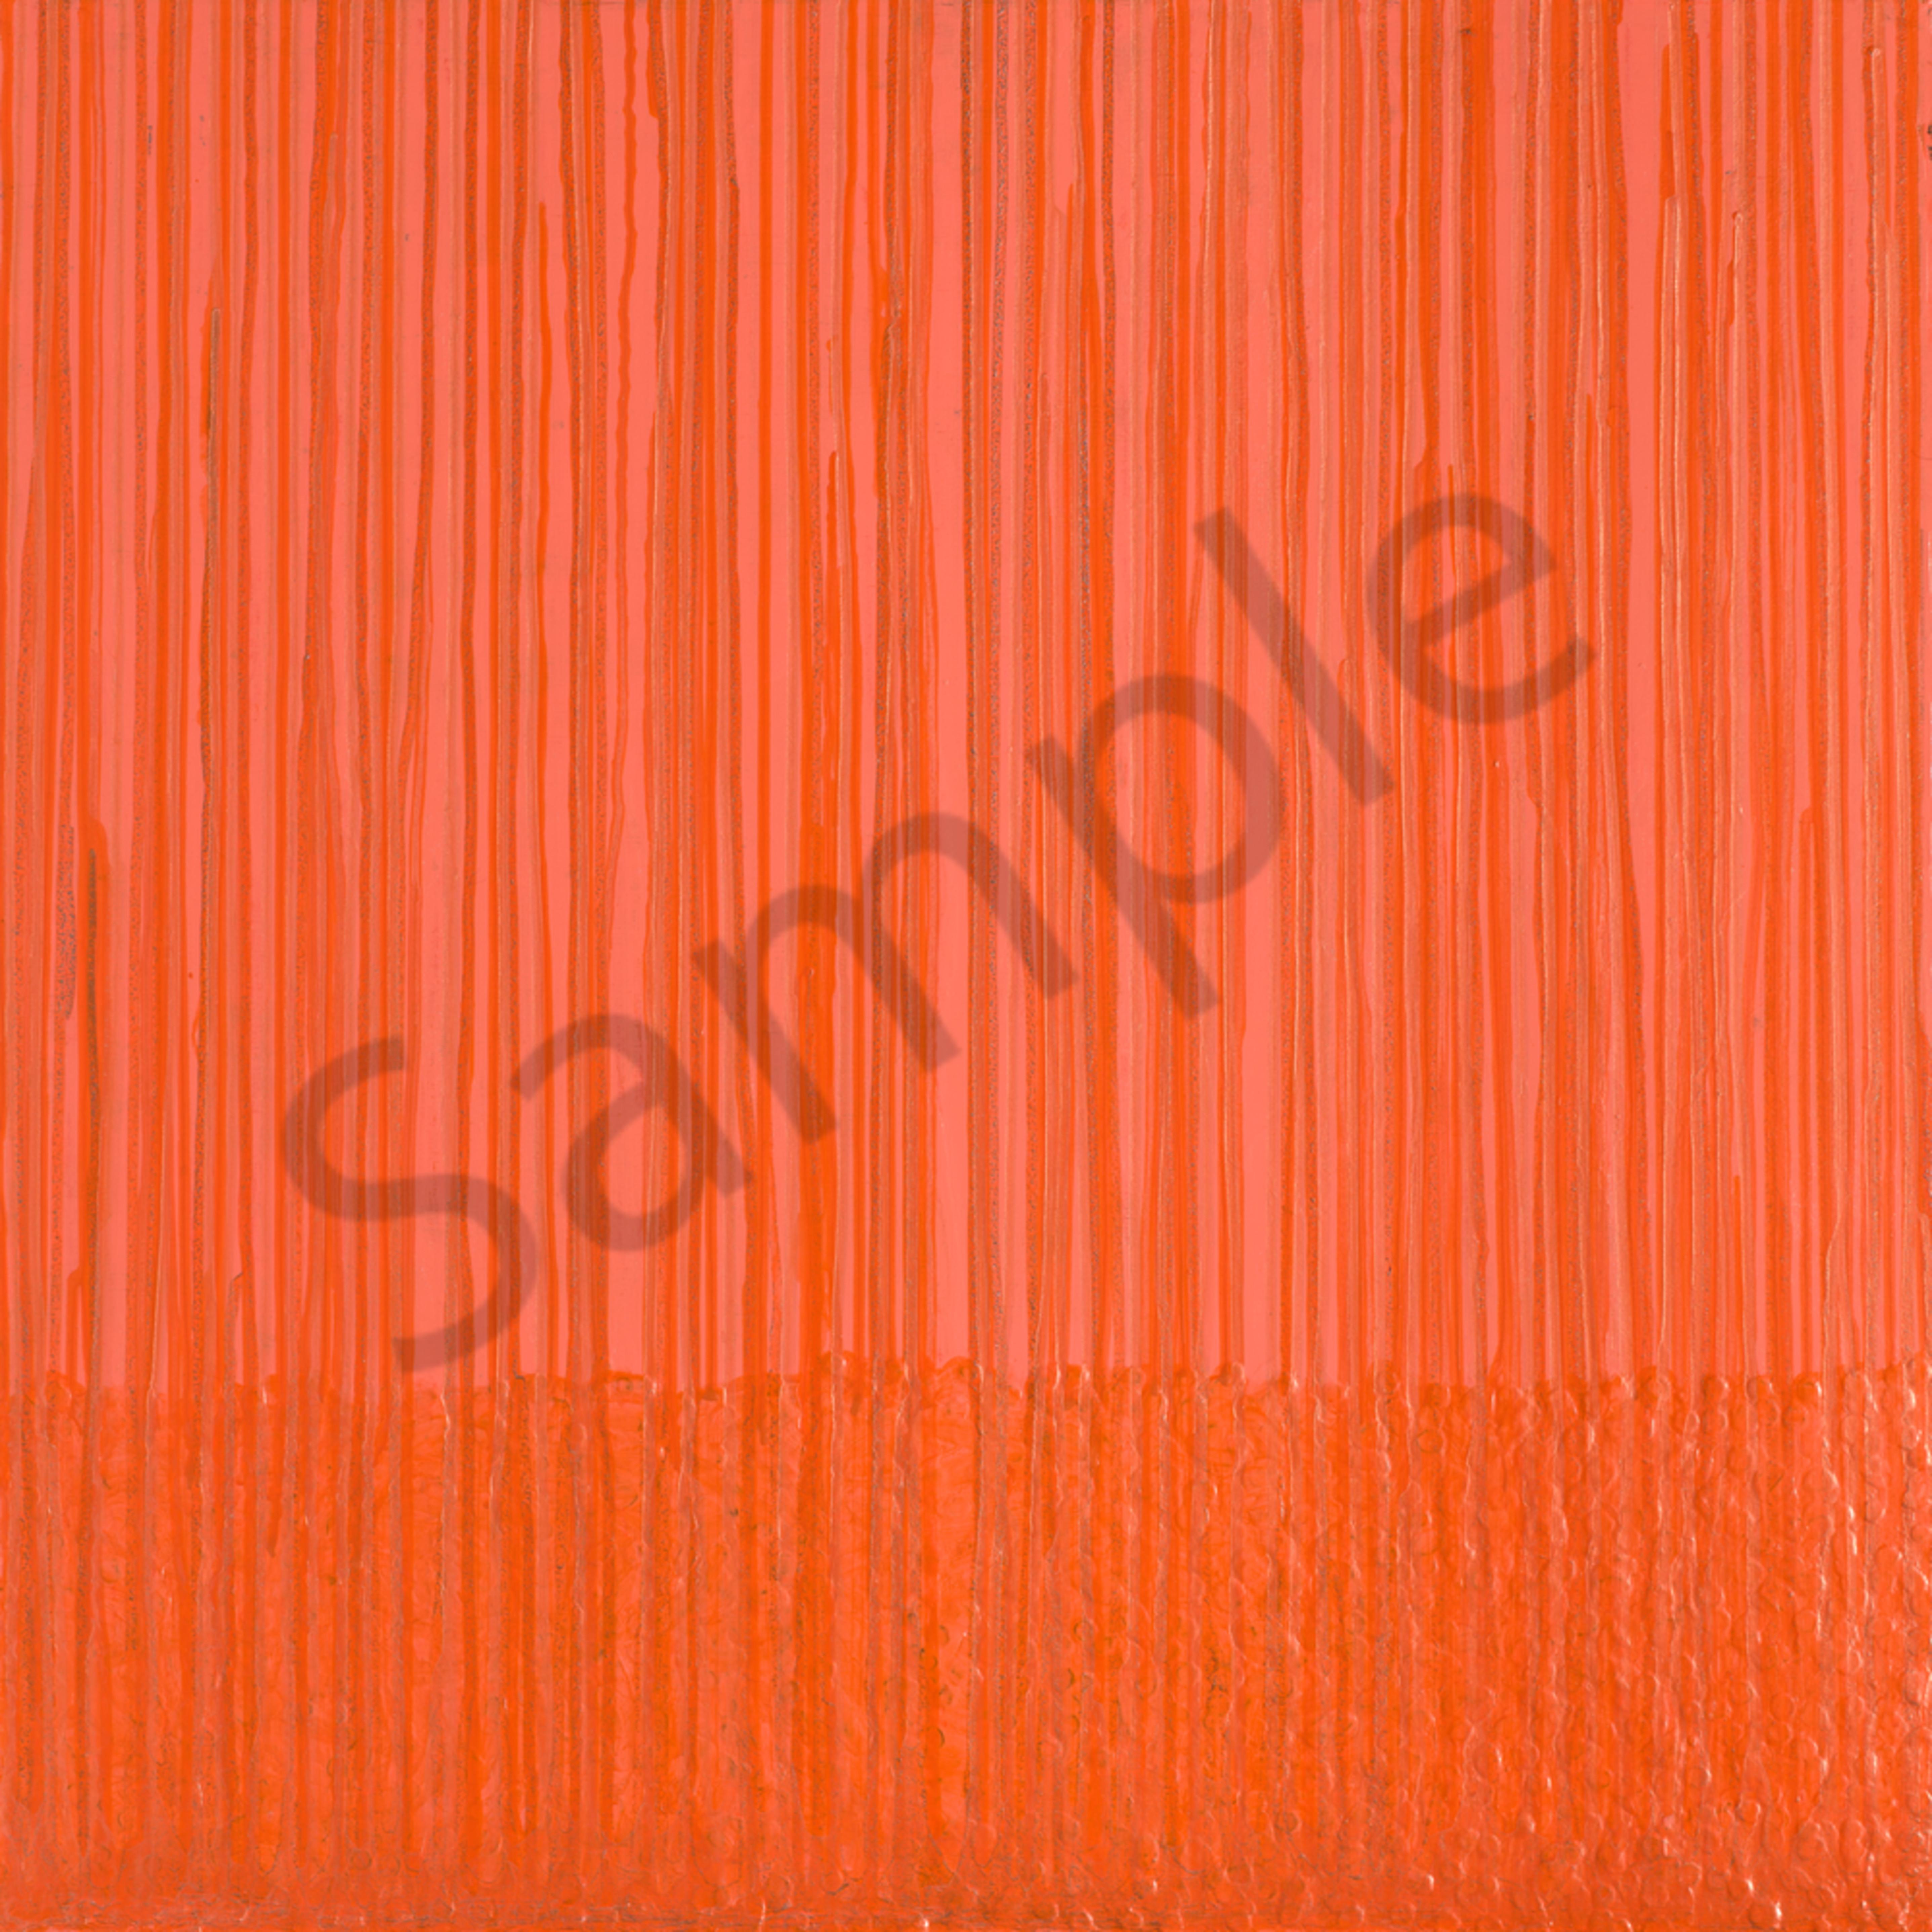 Orange lines with drops yijcuo